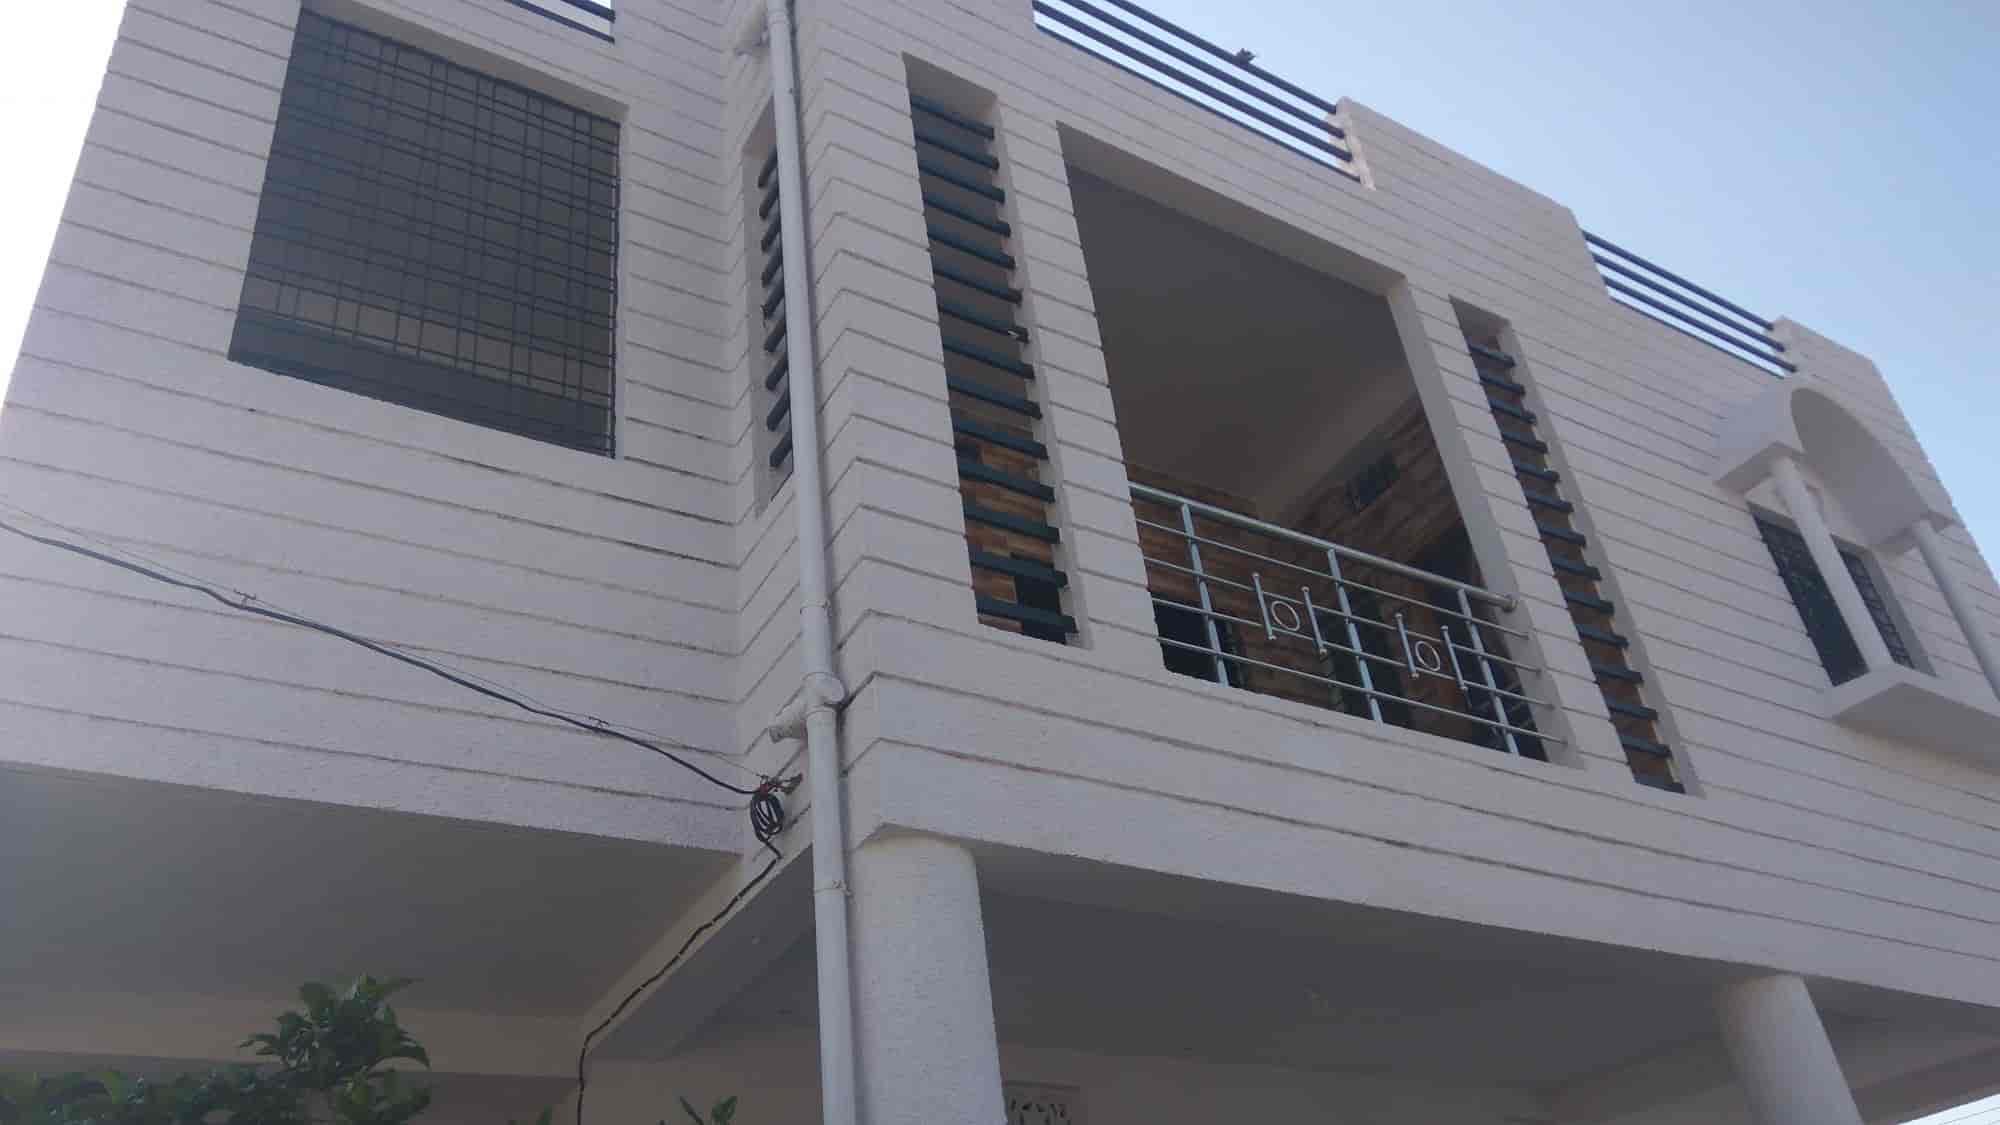 Construction work for building - Katyayani Construction Images, Gittikhadan, Nagpur - Construction Companies